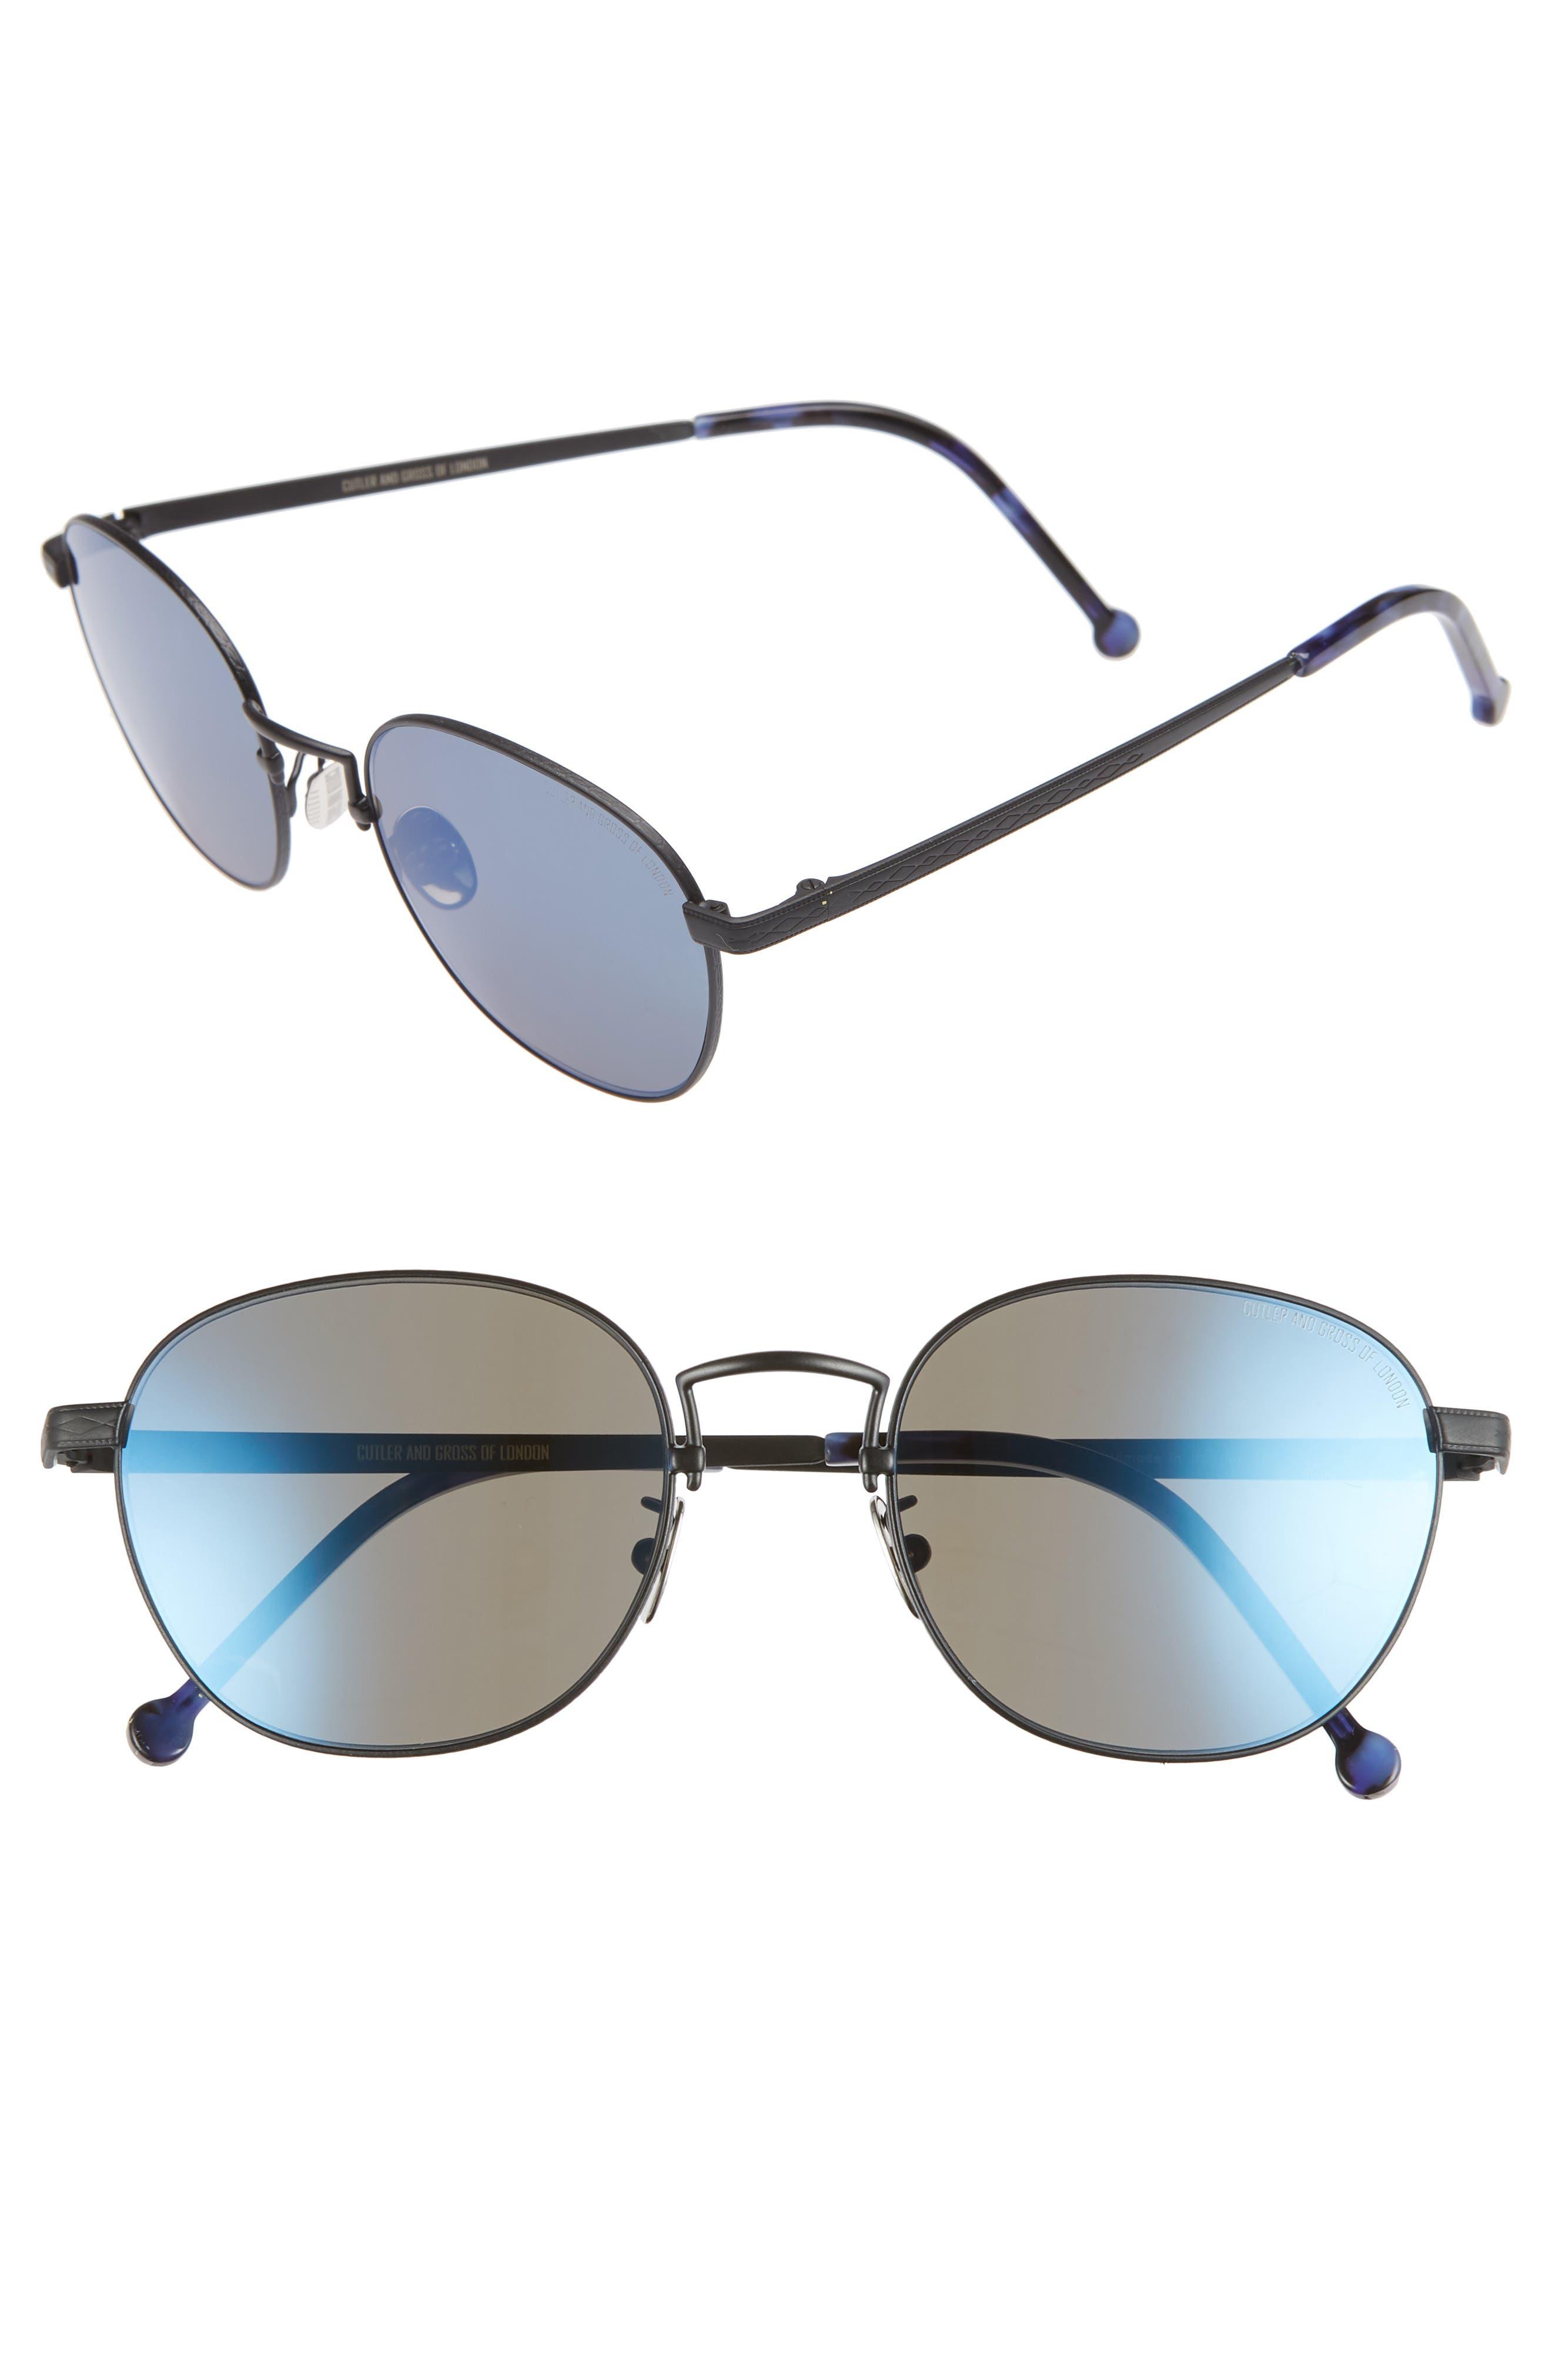 52mm Polarized Round Sunglasses,                             Main thumbnail 1, color,                             SATIN PALLADIUM/ BLUE